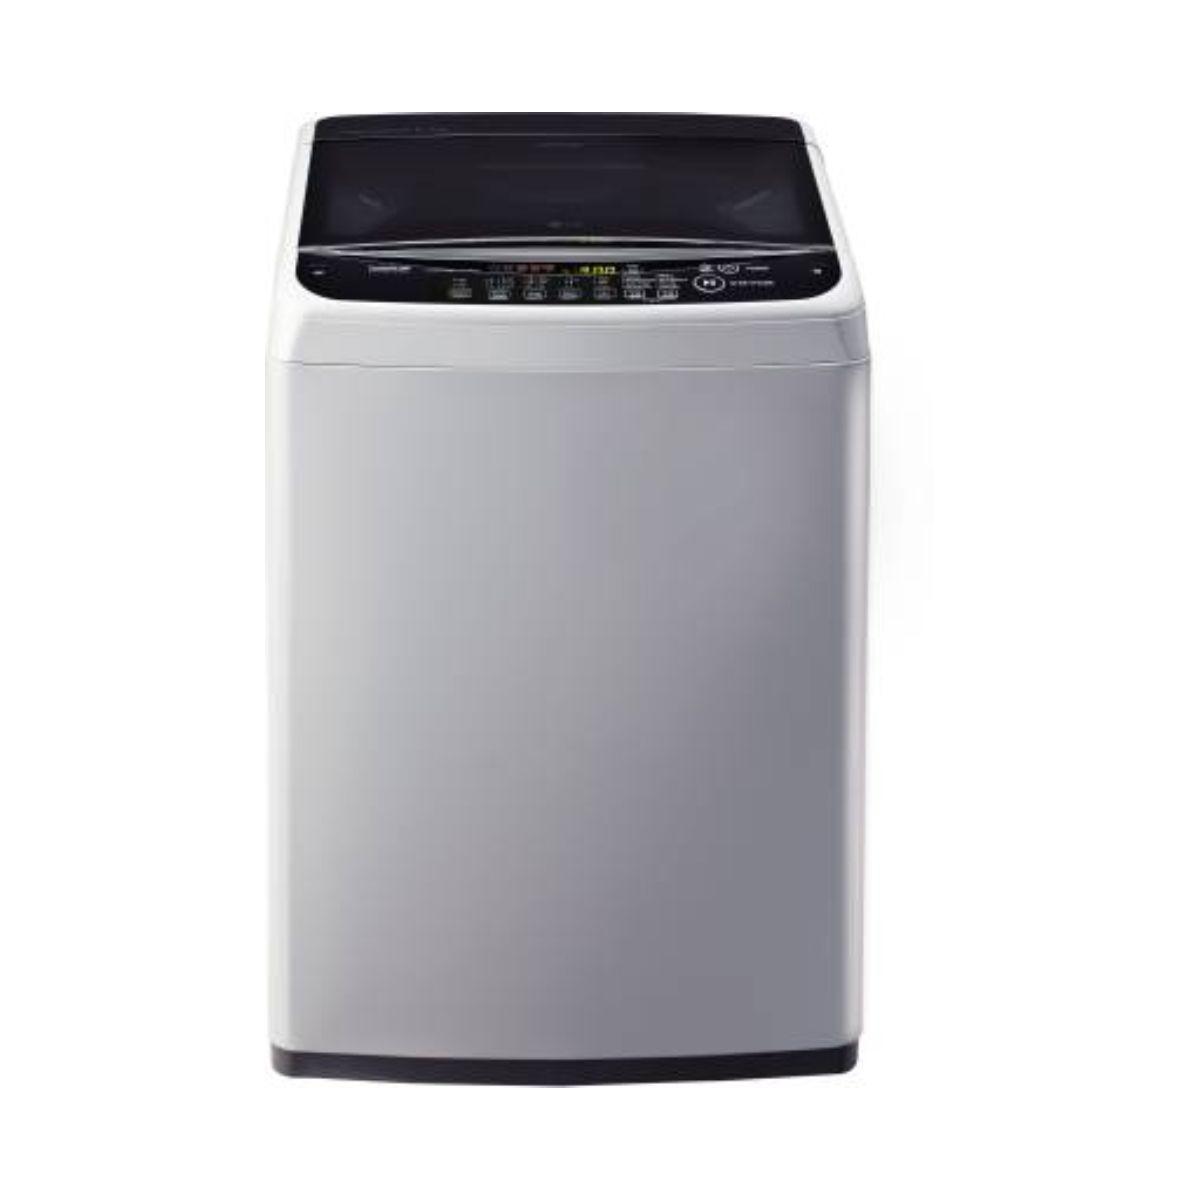 एलजी 6.2 Kg Fully Automatic महत्त्वाचे Load Washing Machine (T7281NDDL)